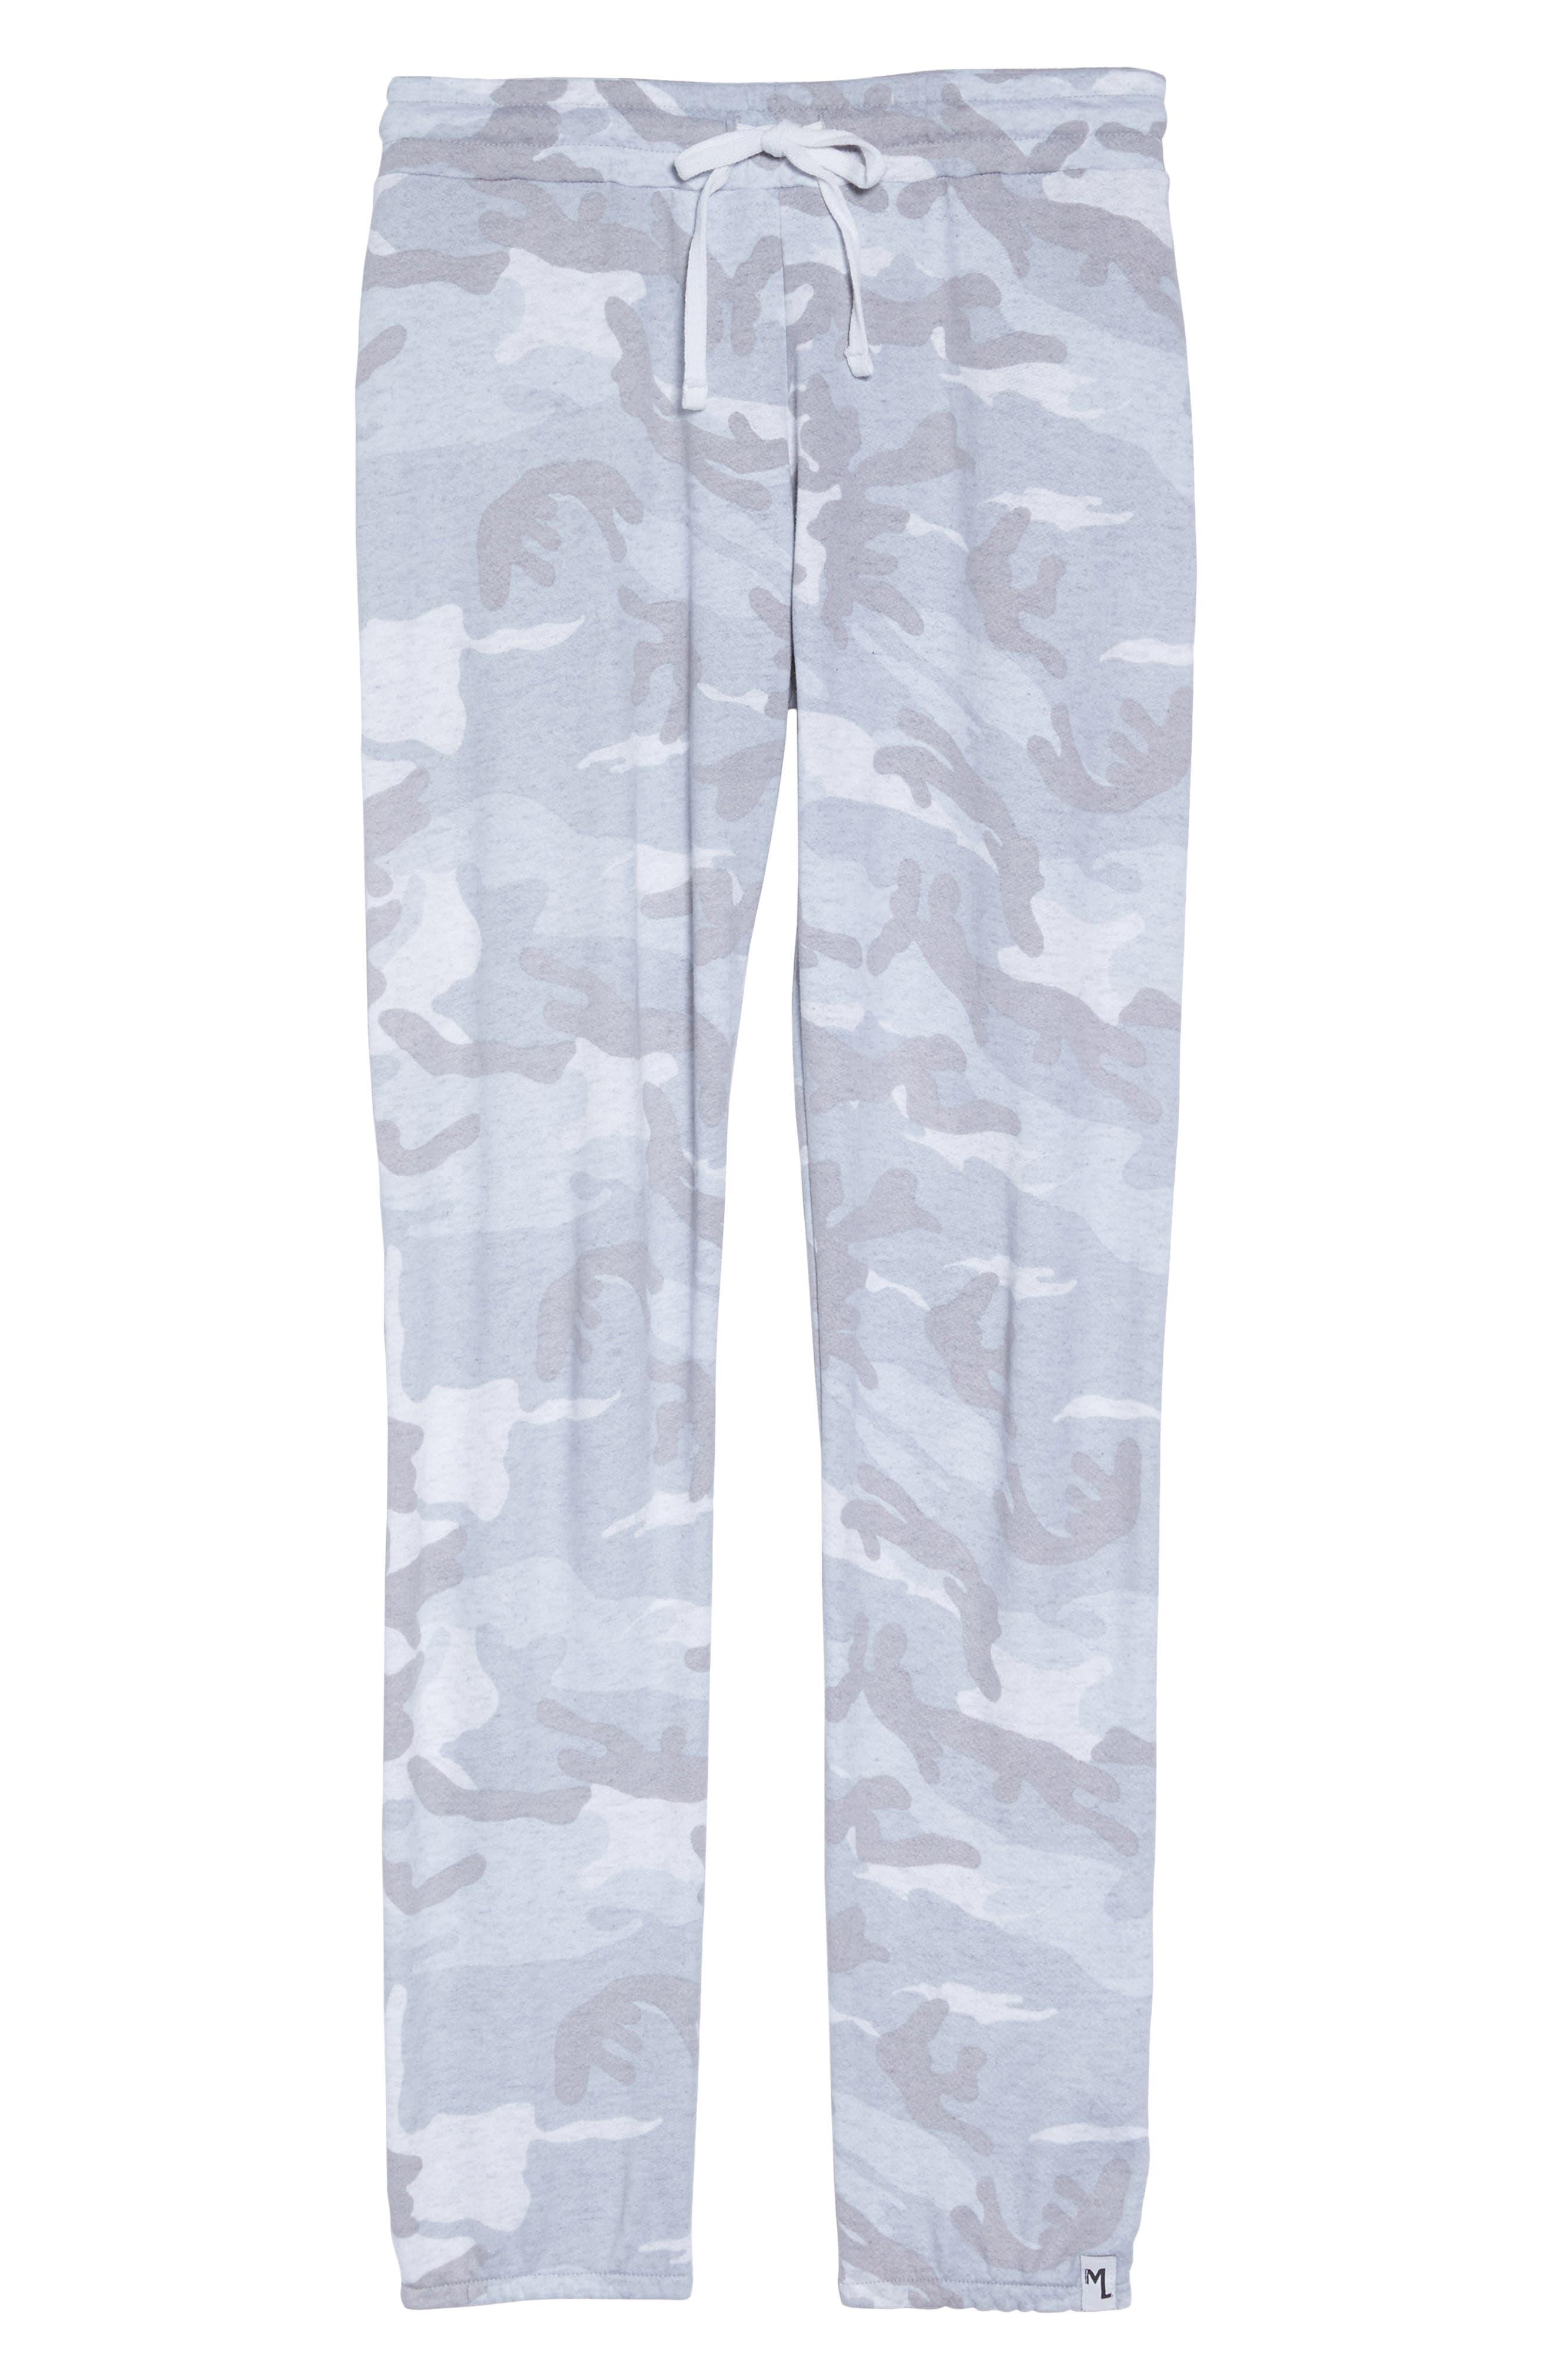 Campbell Vintage Jogger Pants,                             Alternate thumbnail 4, color,                             Light Grey Camo